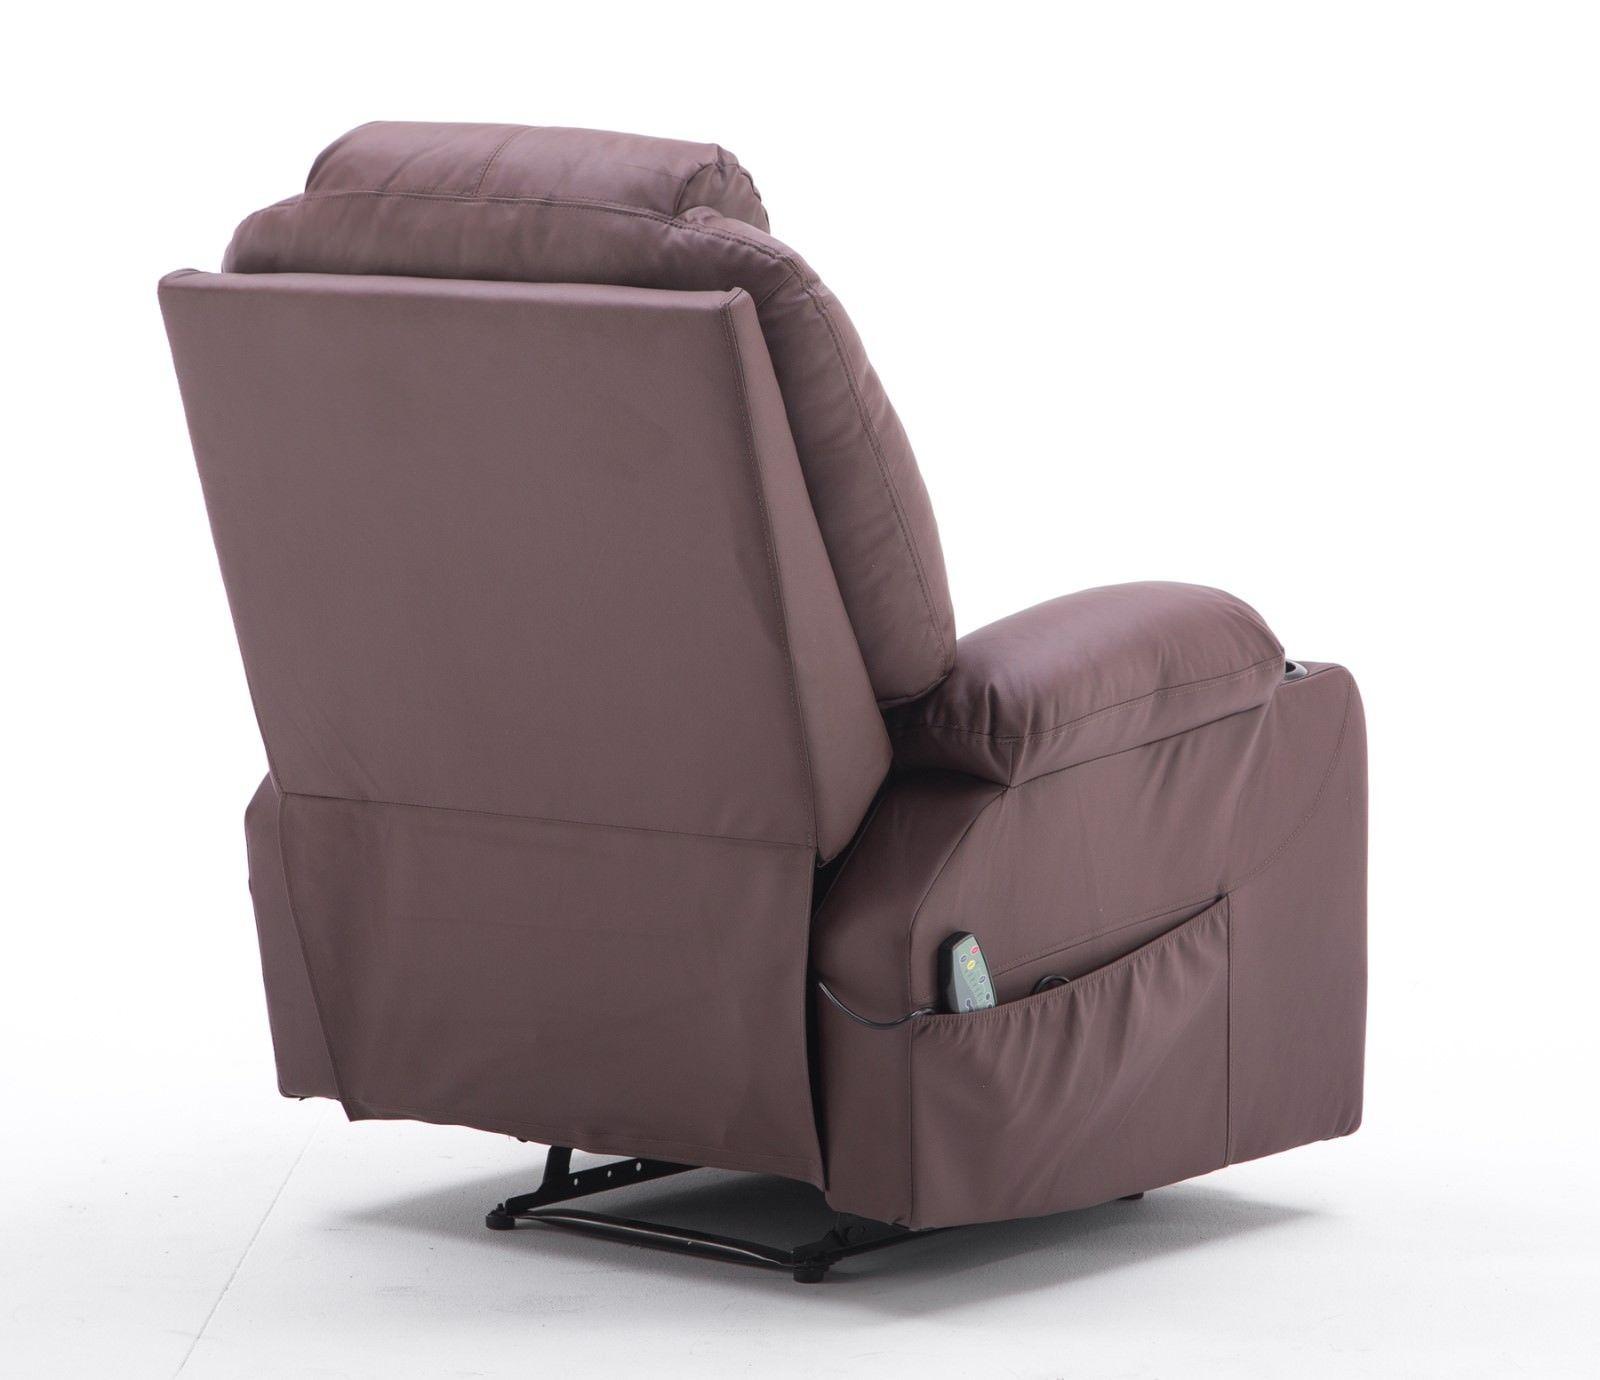 mcombo massagesessel fernsehsessel relaxsessel mit heizung vibration 7031 ebay. Black Bedroom Furniture Sets. Home Design Ideas